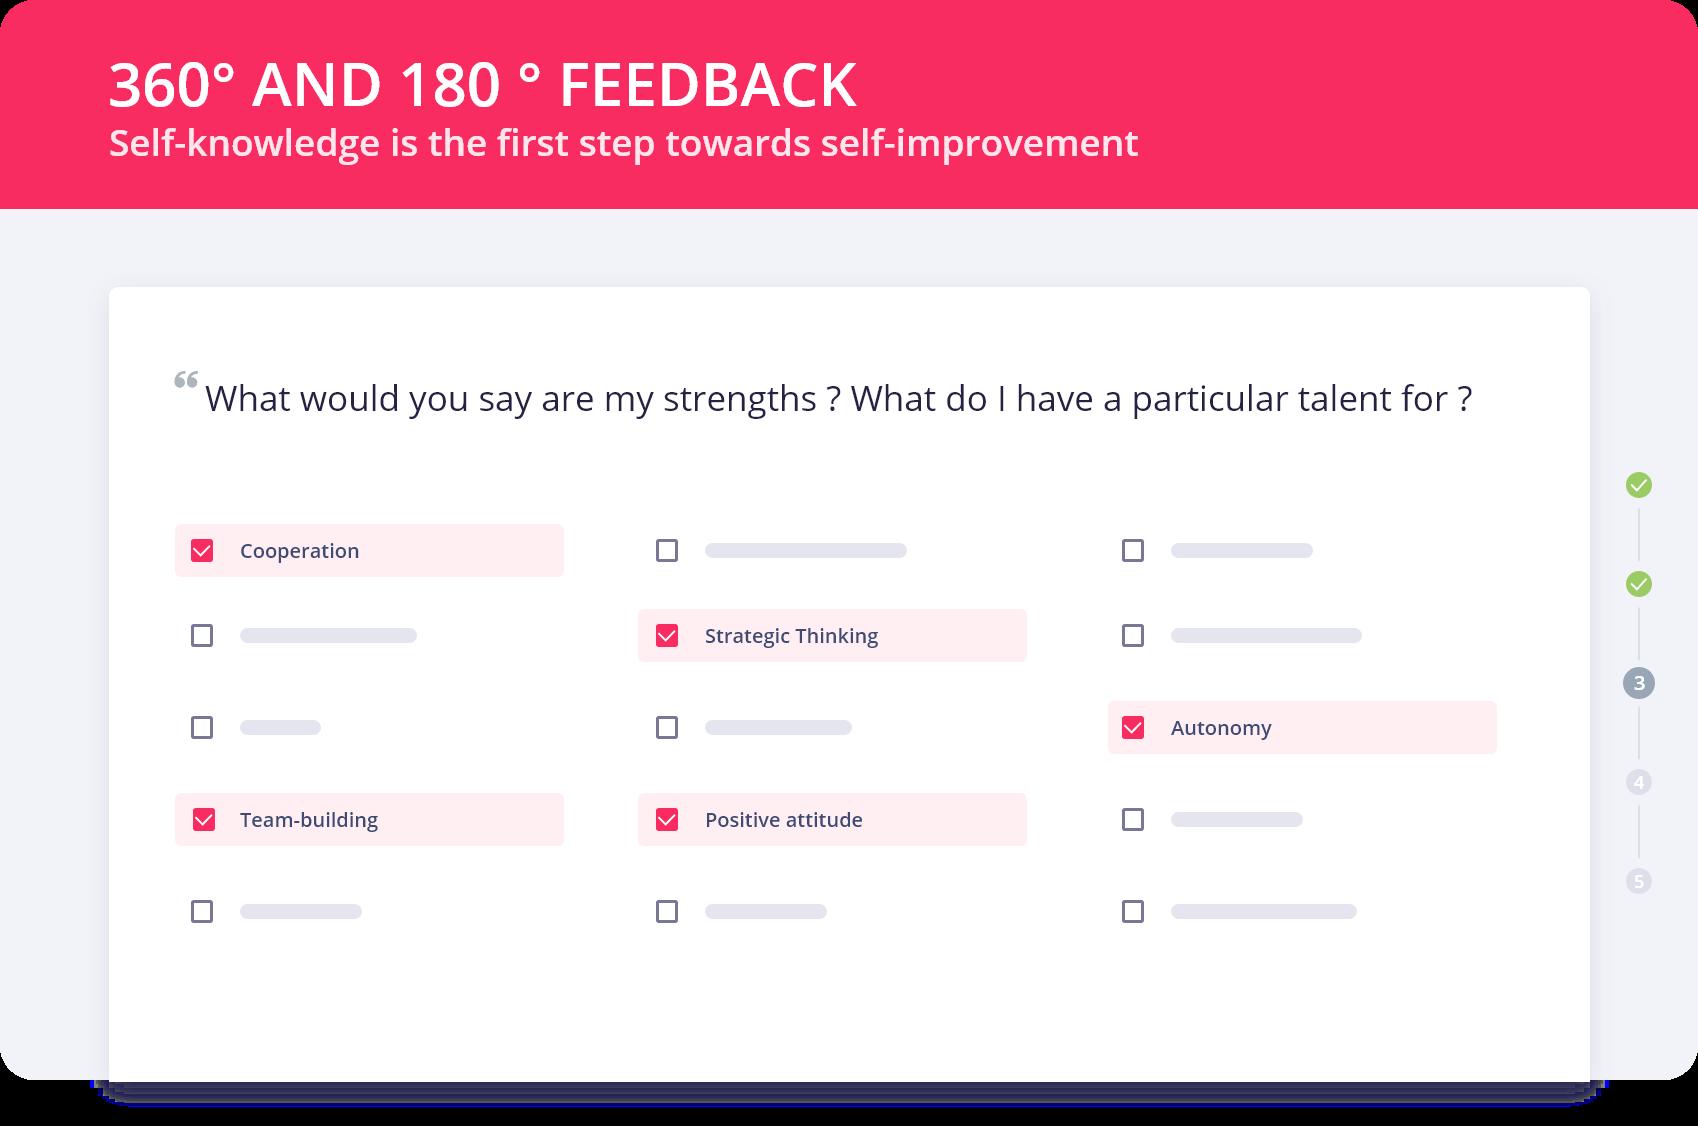 360° and 180° feedback